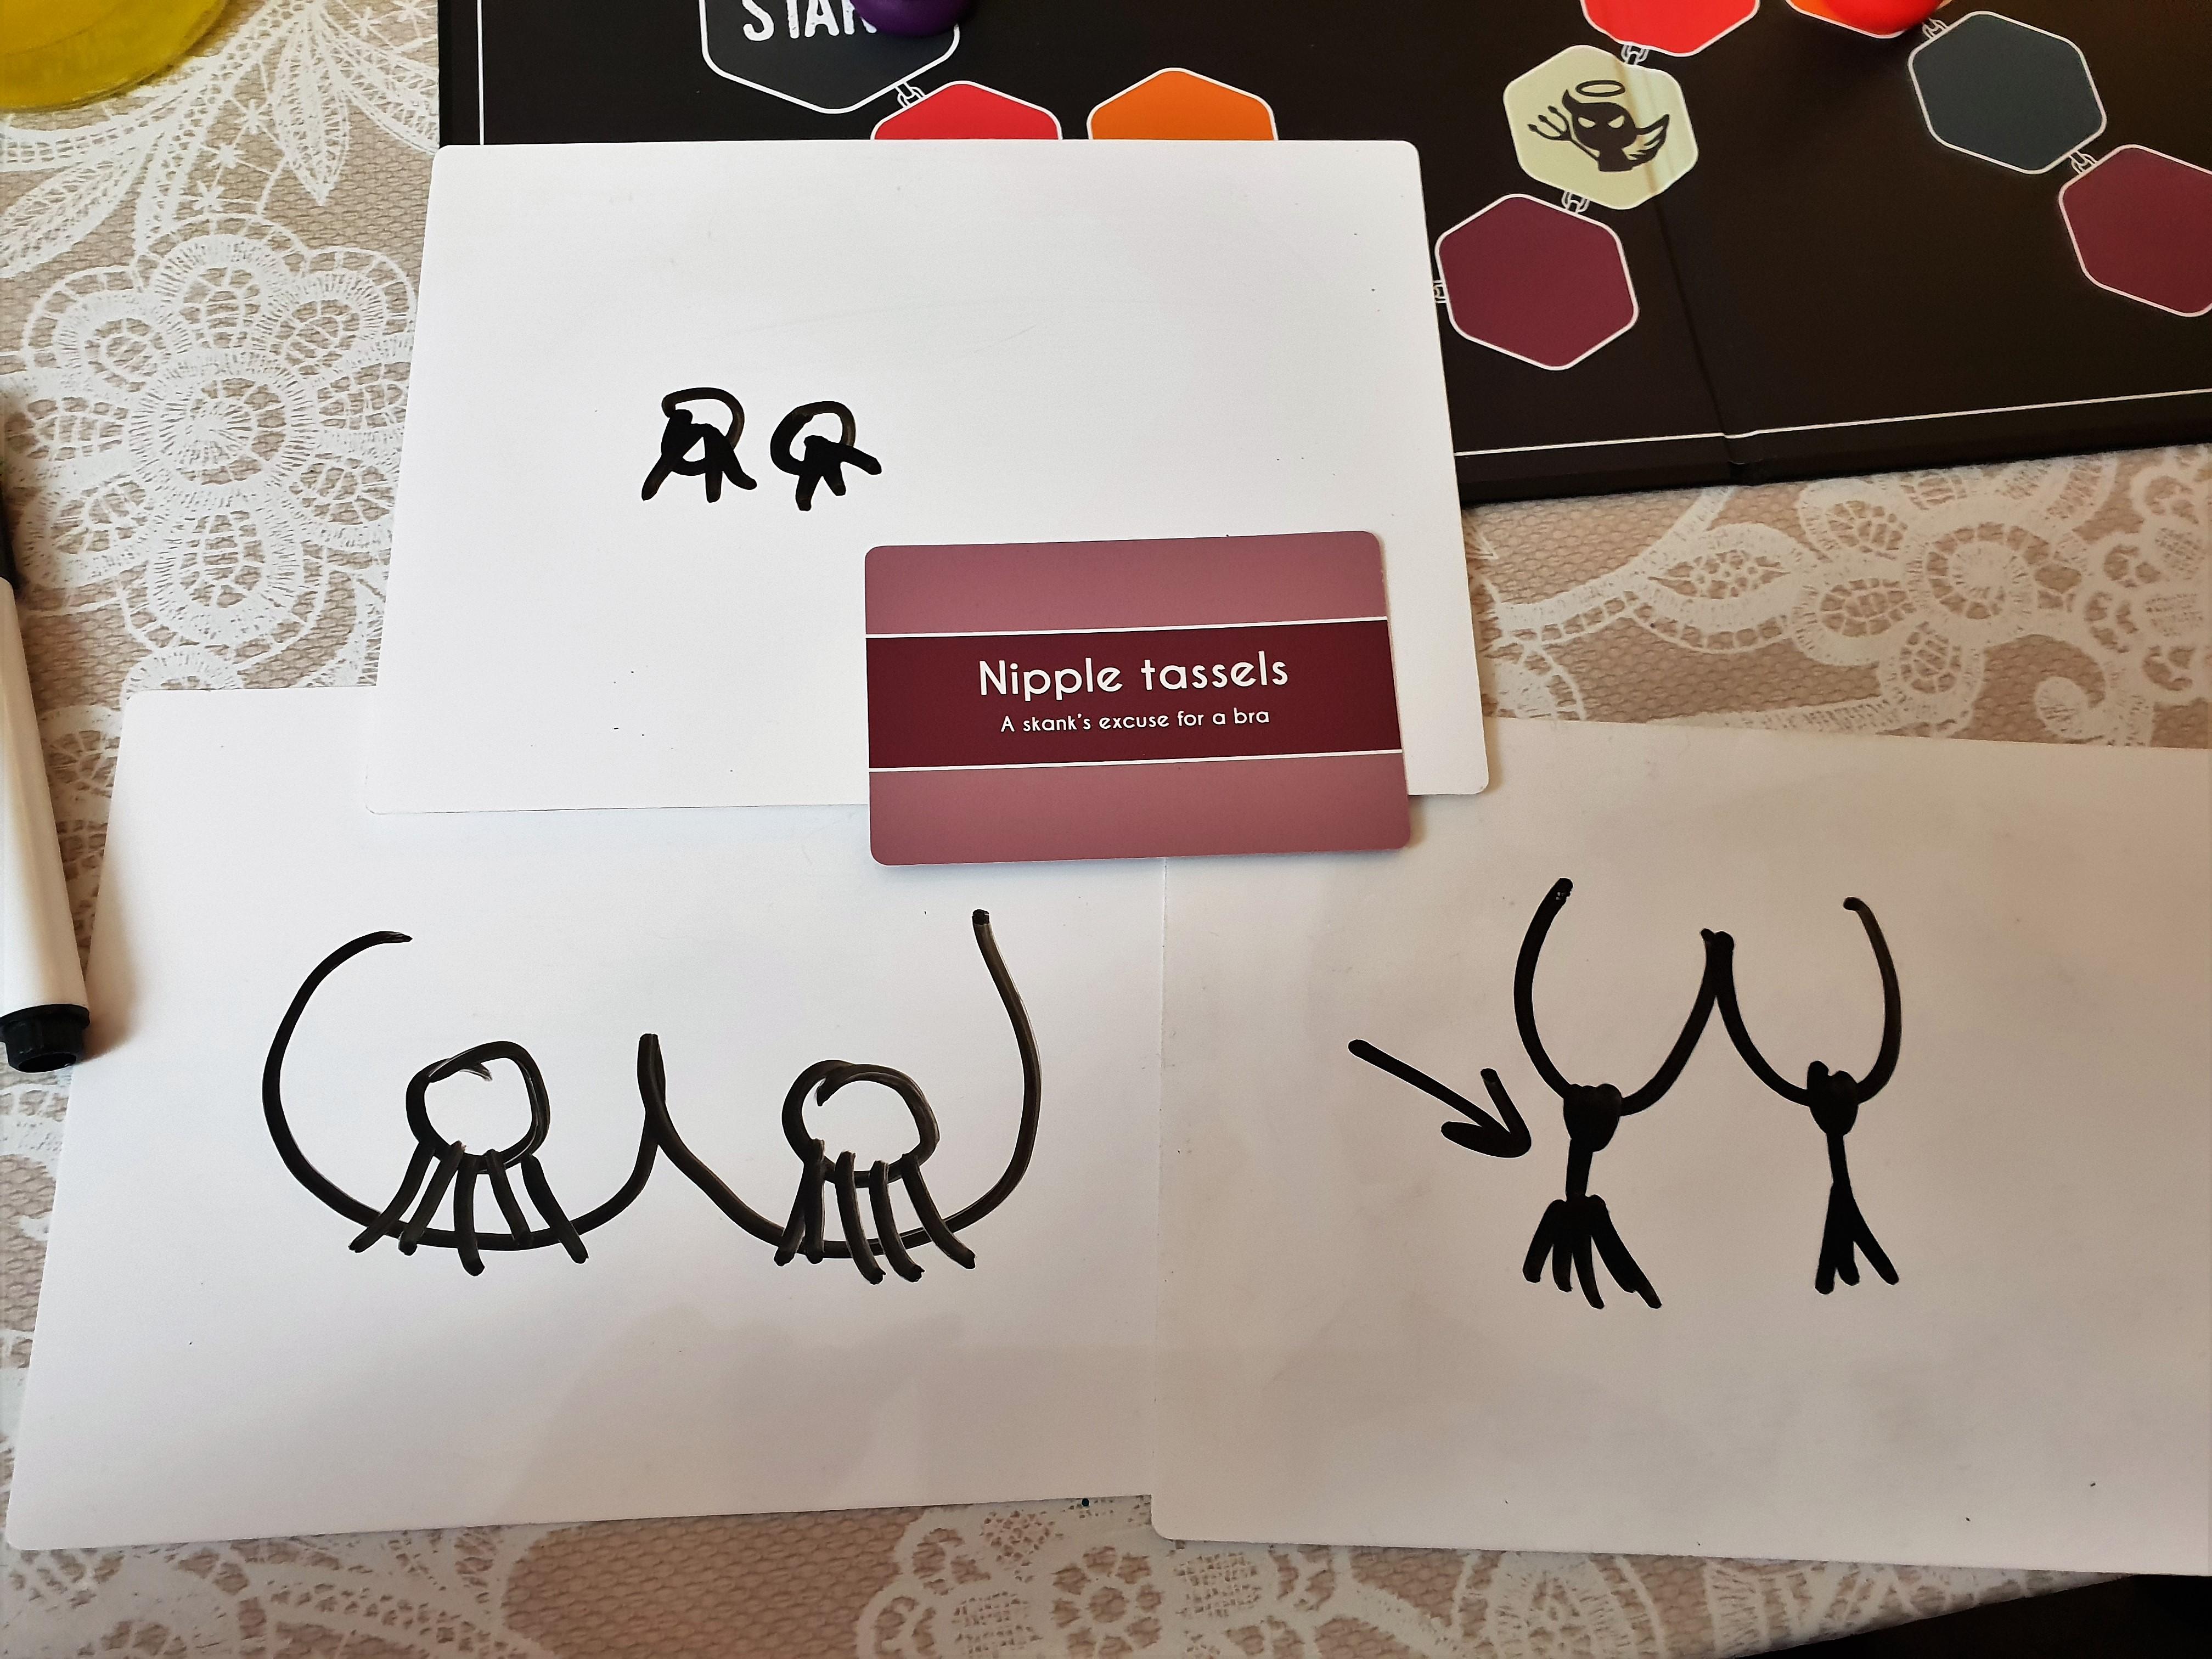 Gutterhead drawing nipple tassels